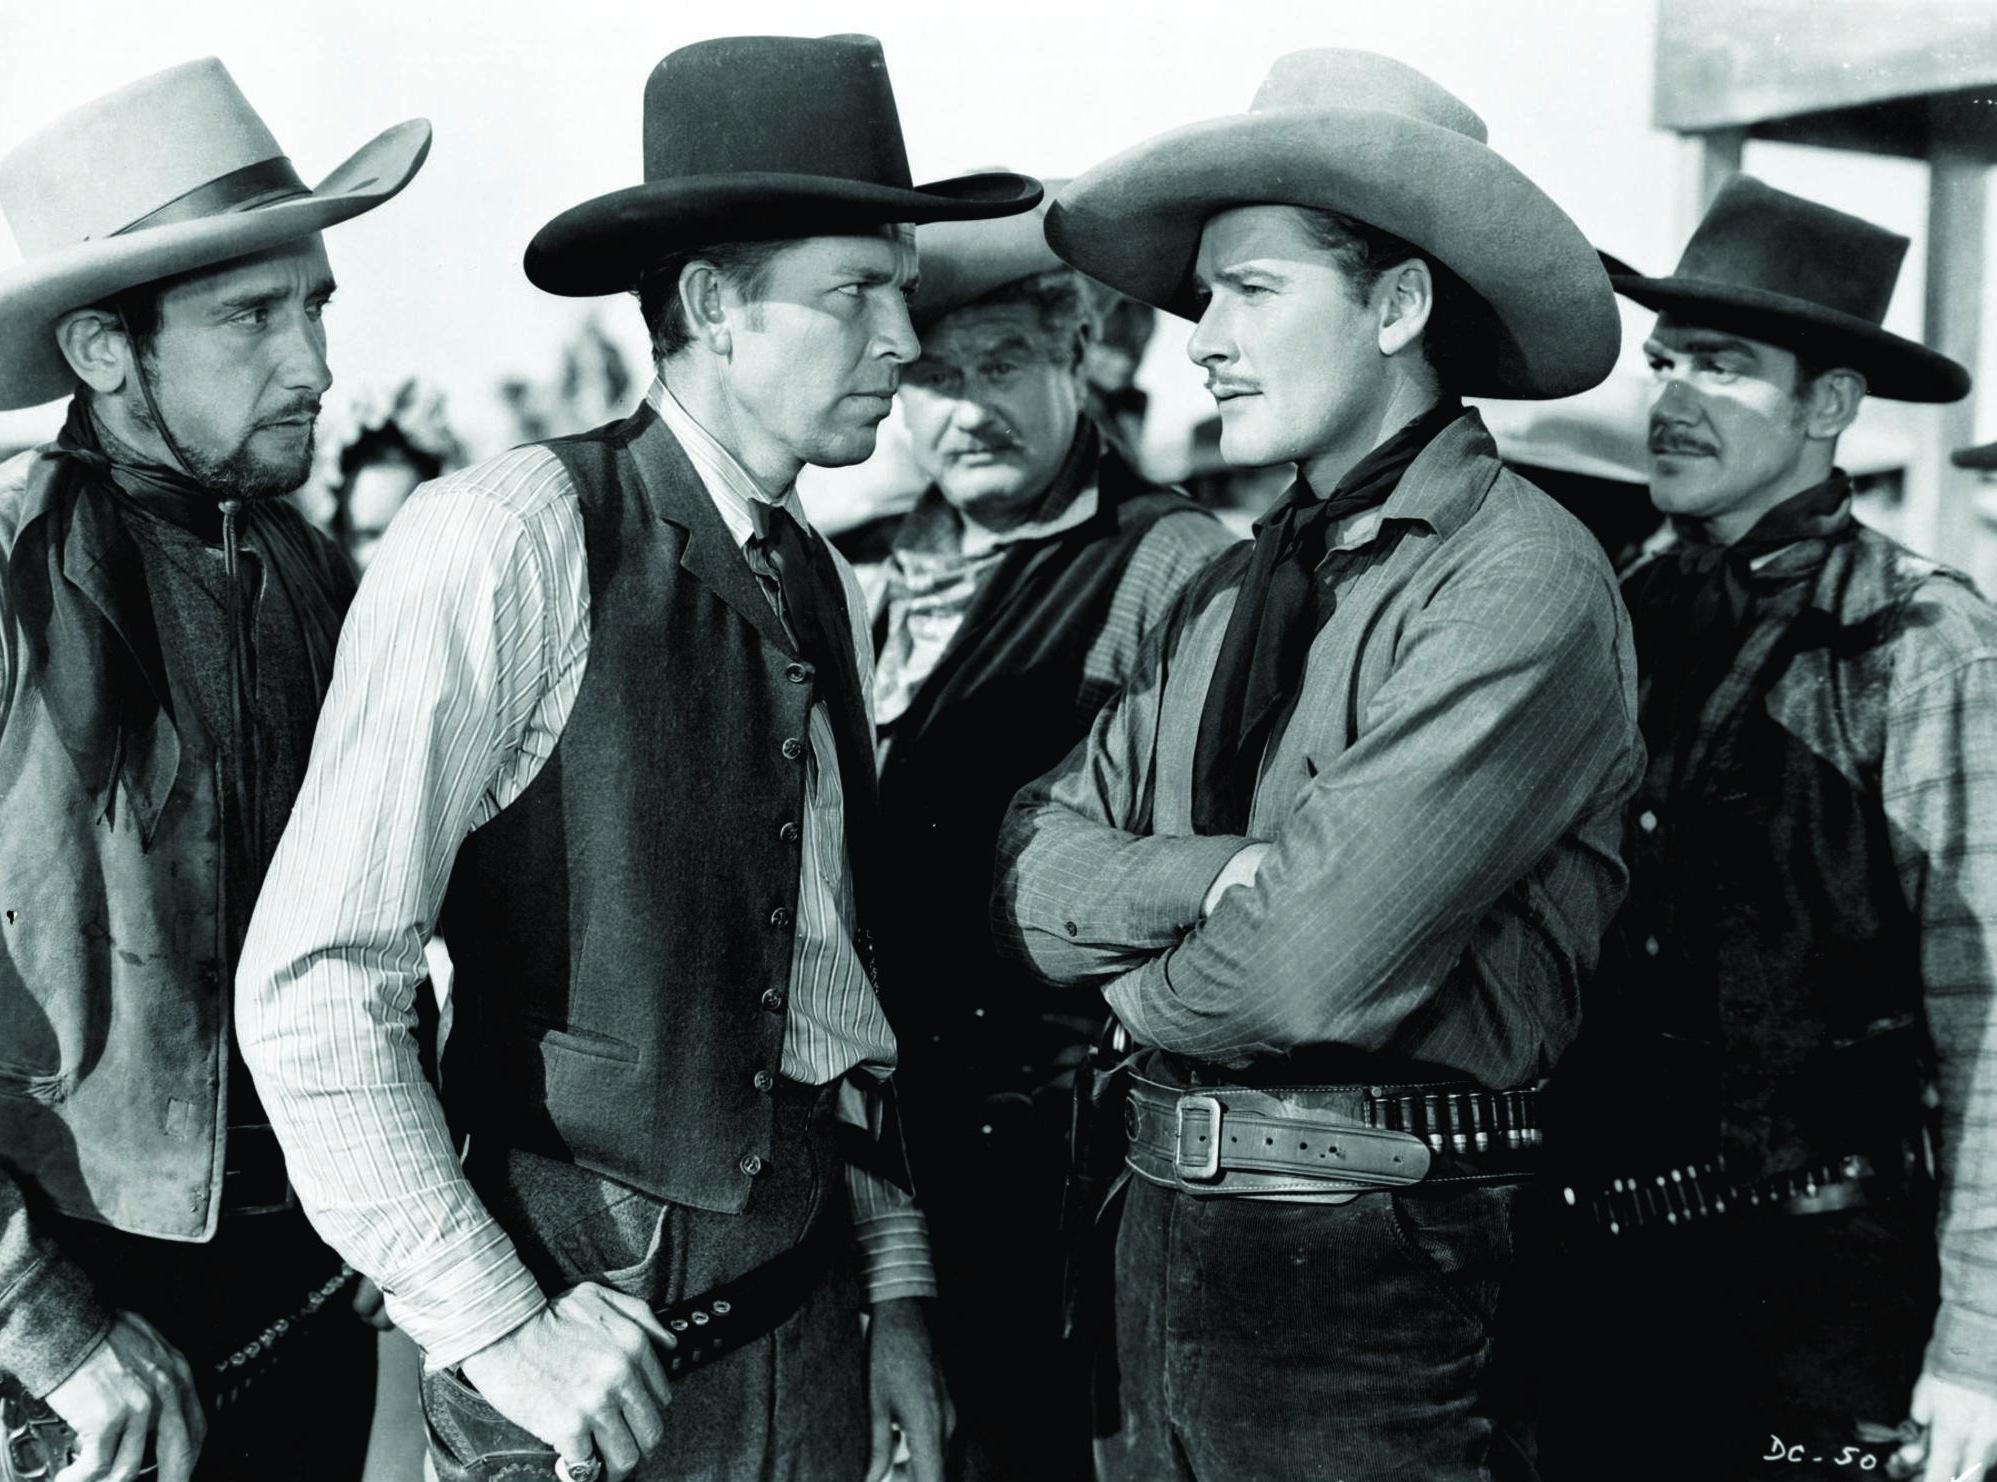 Errol Flynn, Alan Hale, Bruce Cabot, Douglas Fowley, and Victor Jory in Dodge City (1939)